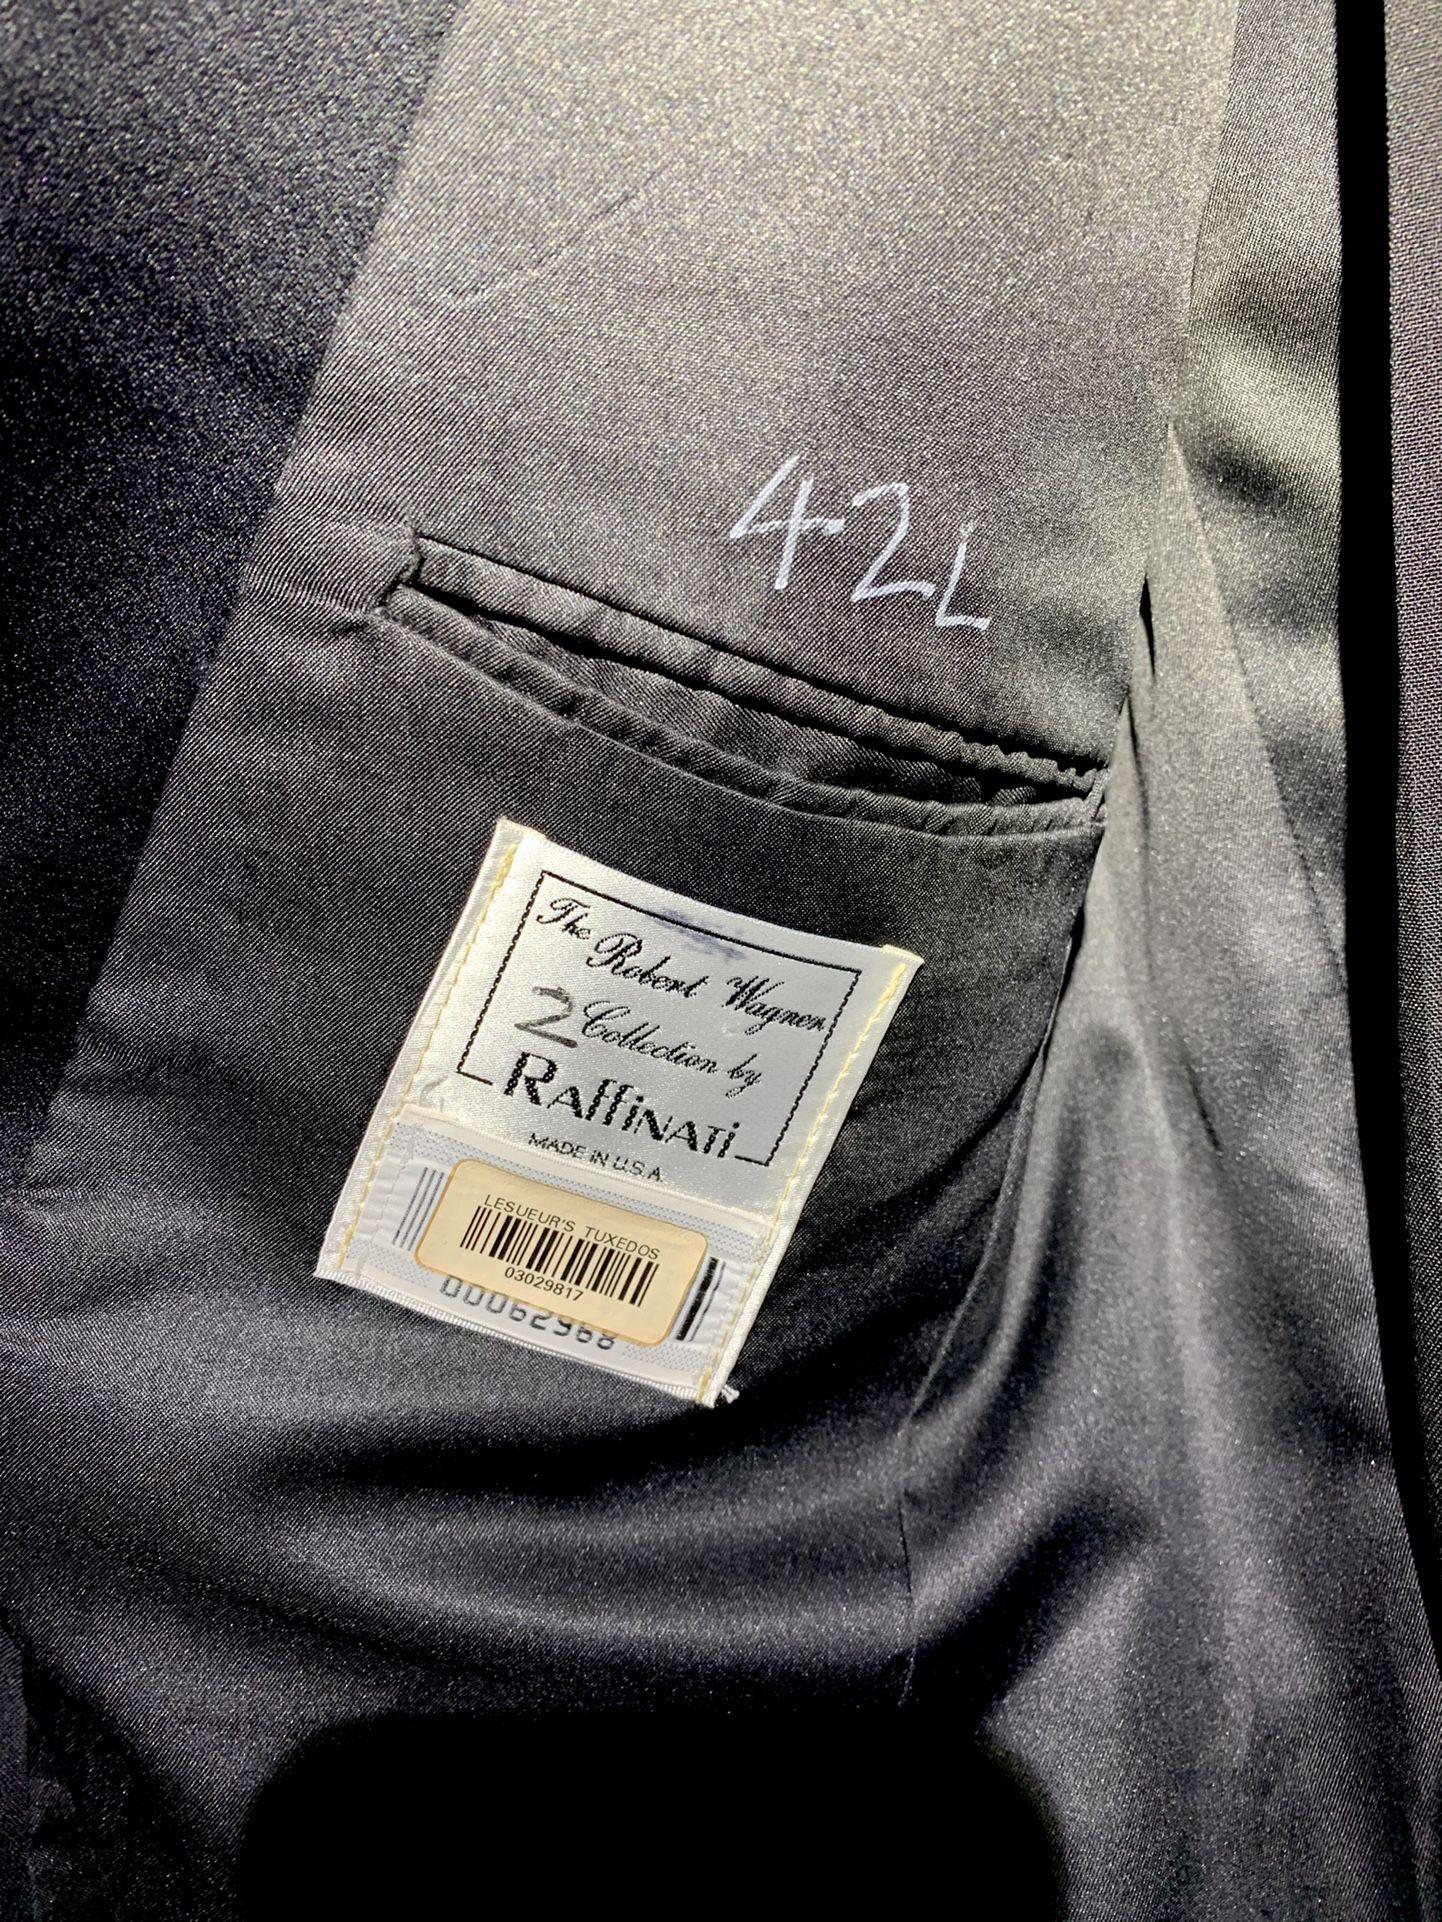 Men's USA formal black / white tuxedo, 42L dress jacket, 34L long pants (34x34), tux sash, bow tie